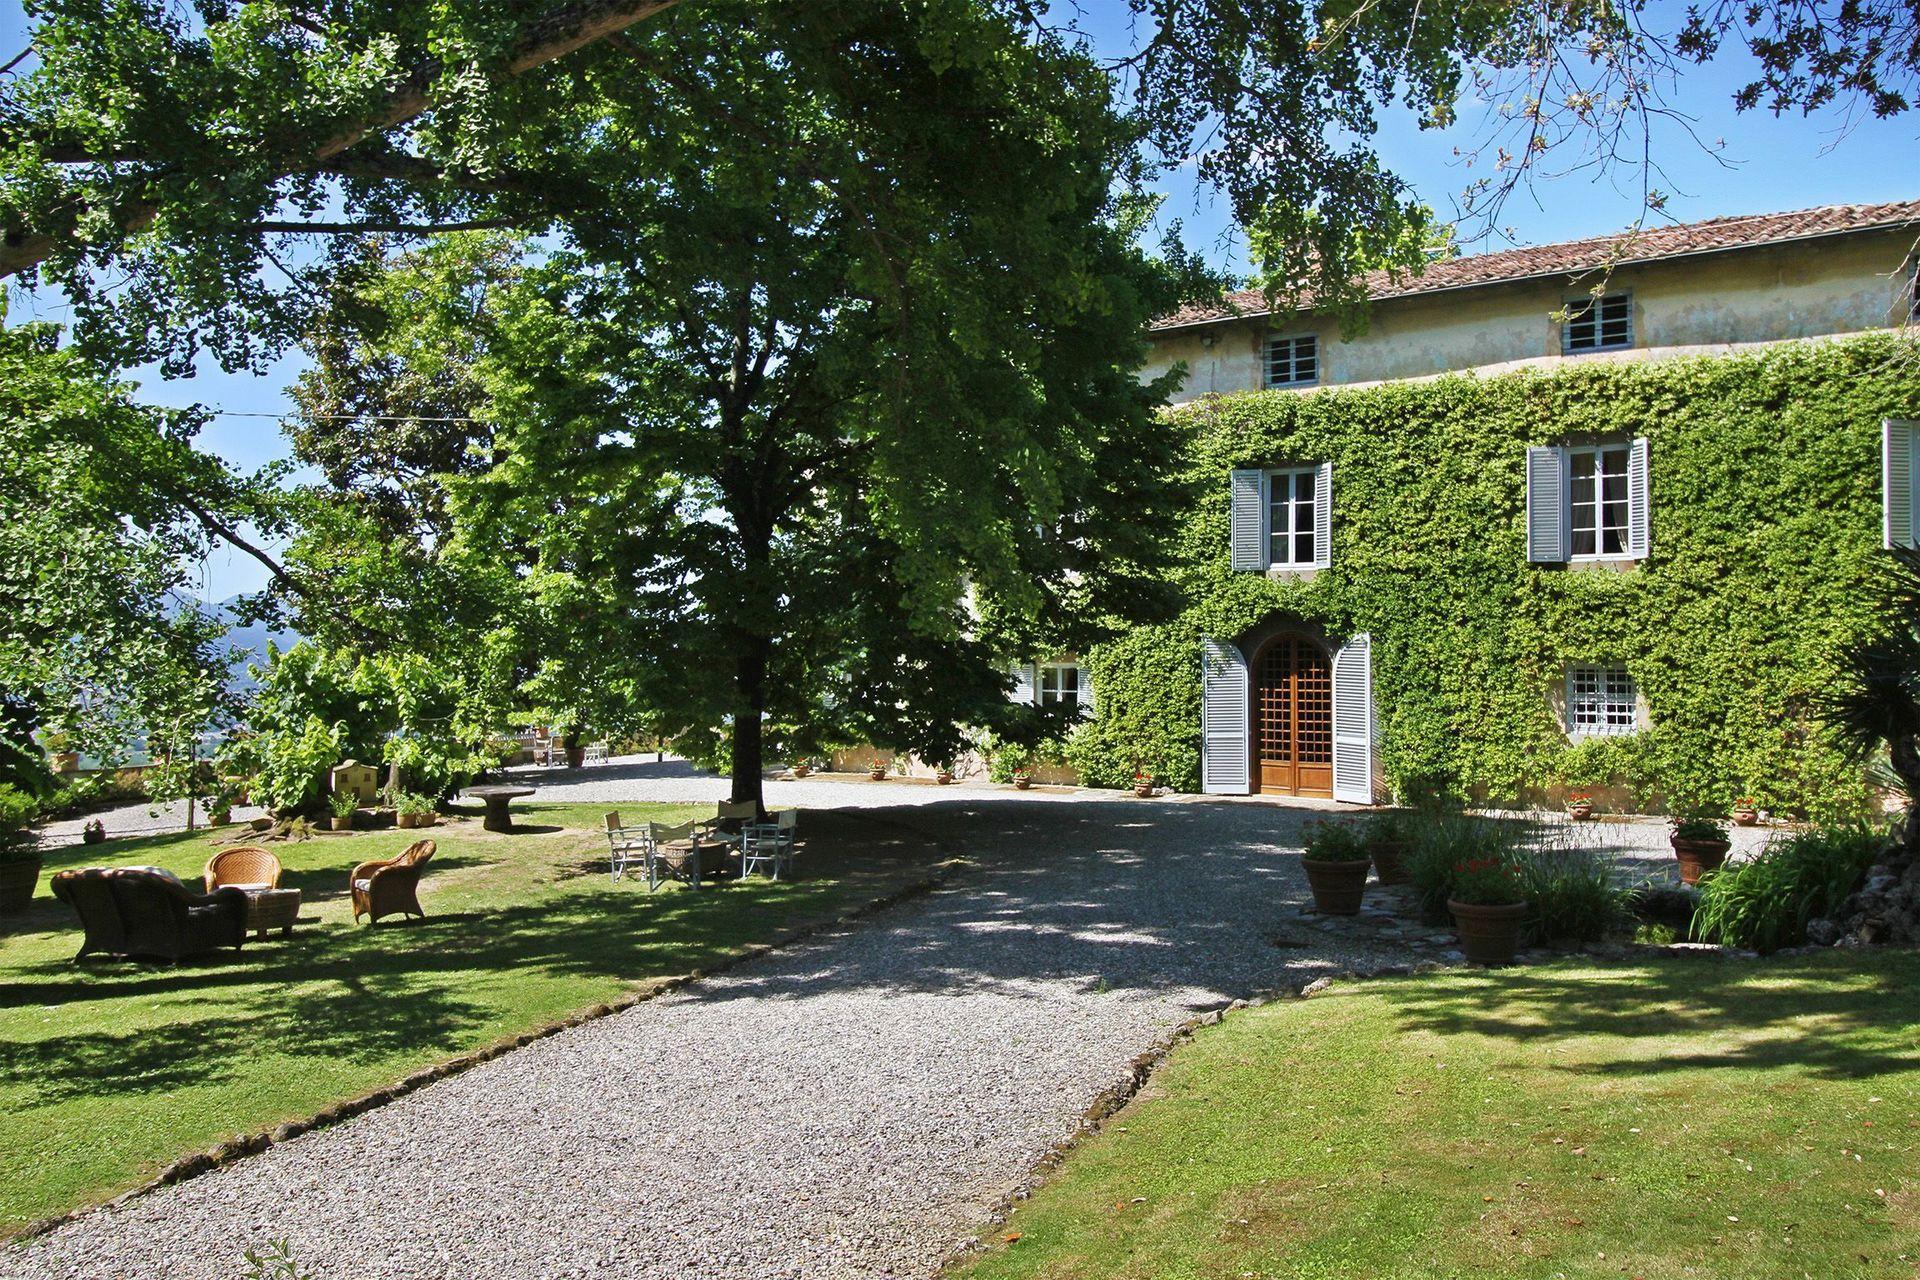 Segromigno In Monte Vacation Rental   Villa Imperatore that